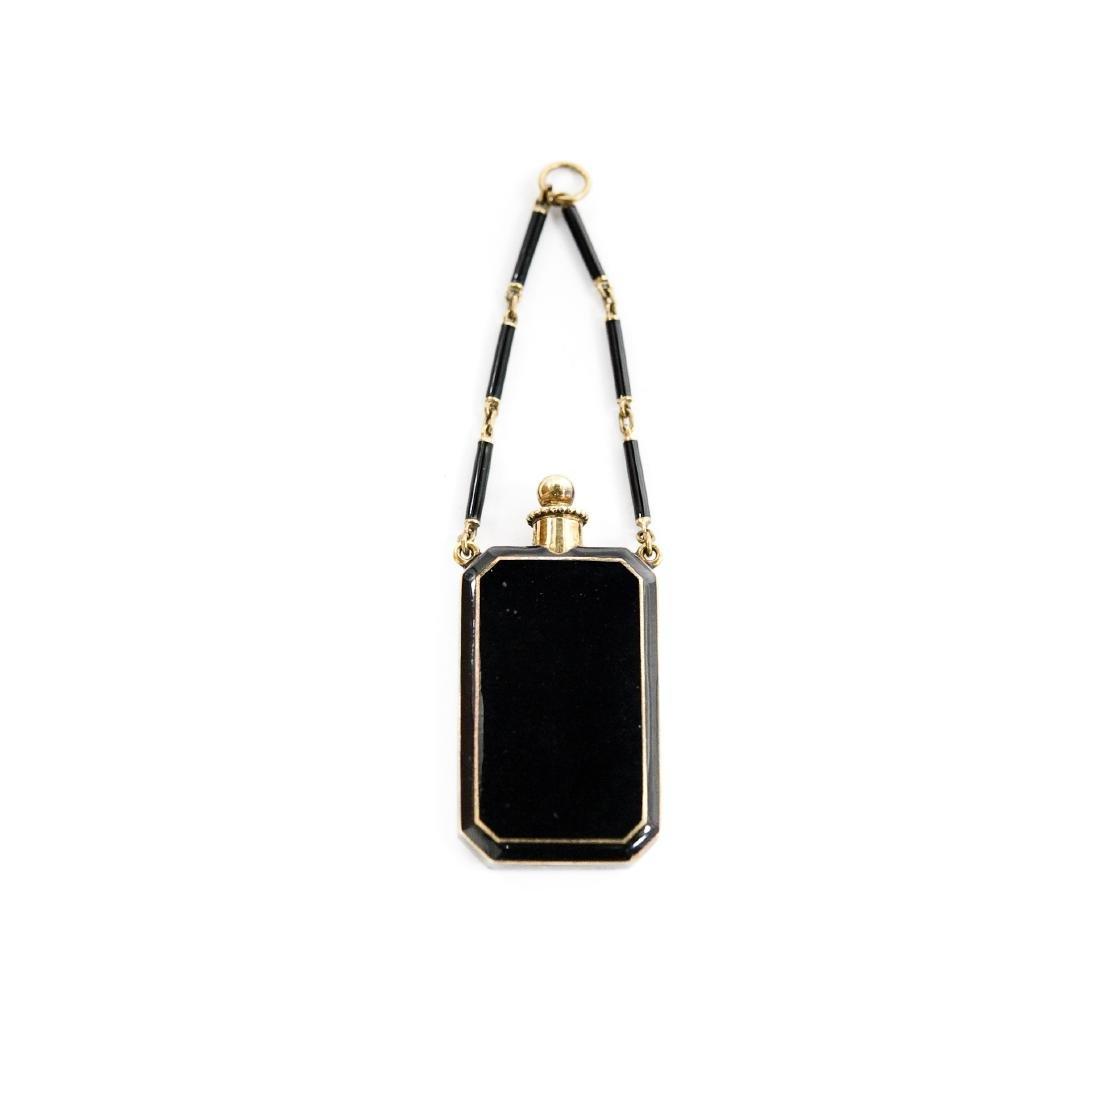 Tiffany & Co. 14K Enameled Perfume bottle/Vinaigrette.